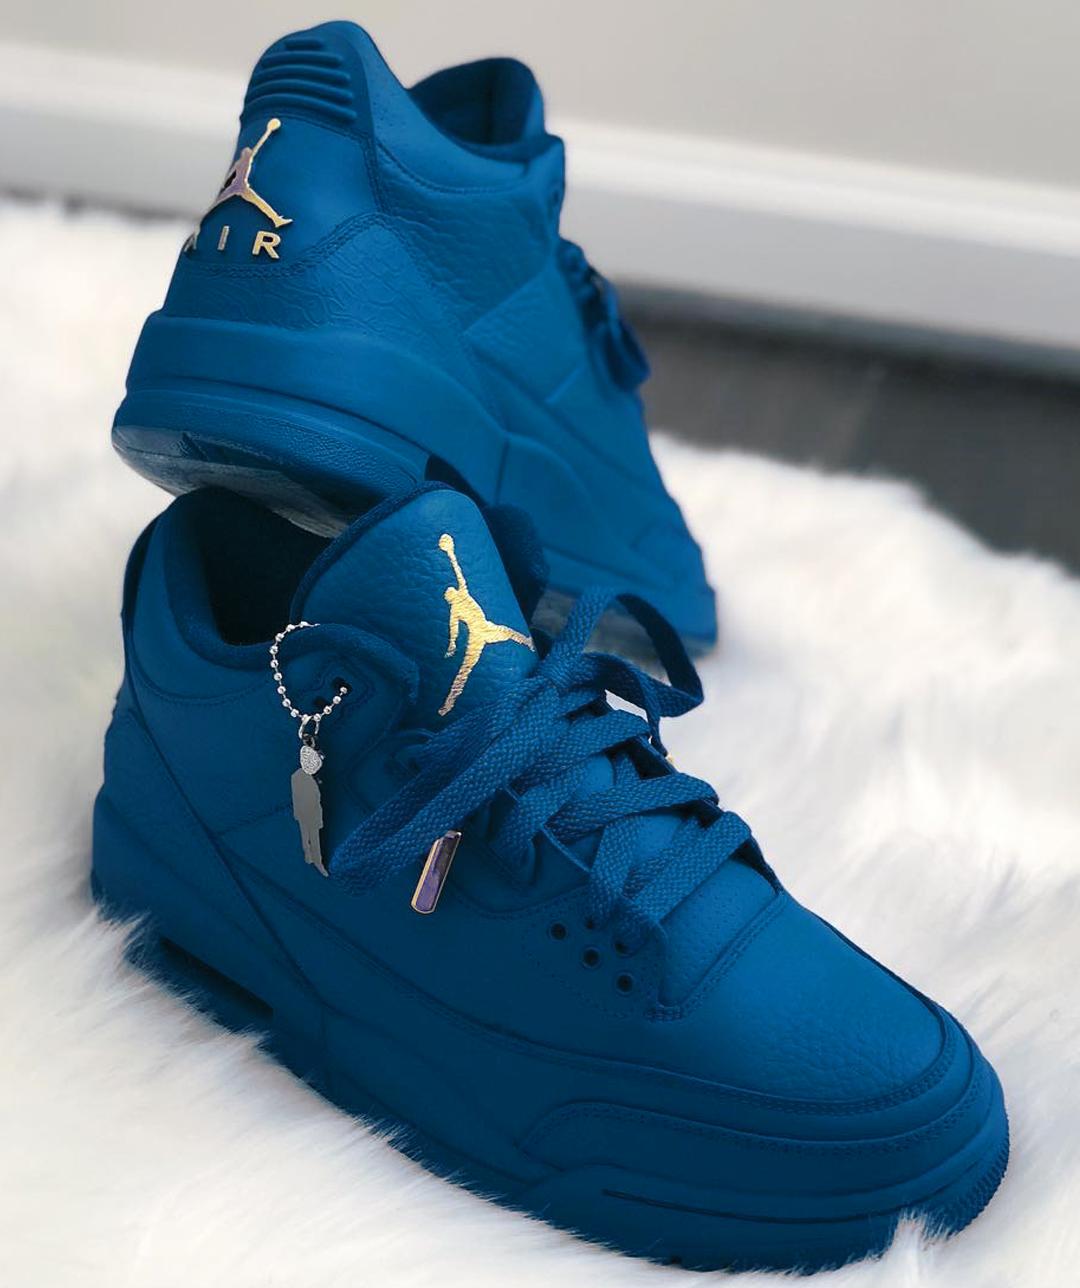 Air Jordan 3s Sneakers fashion, Blue jordans, Womens